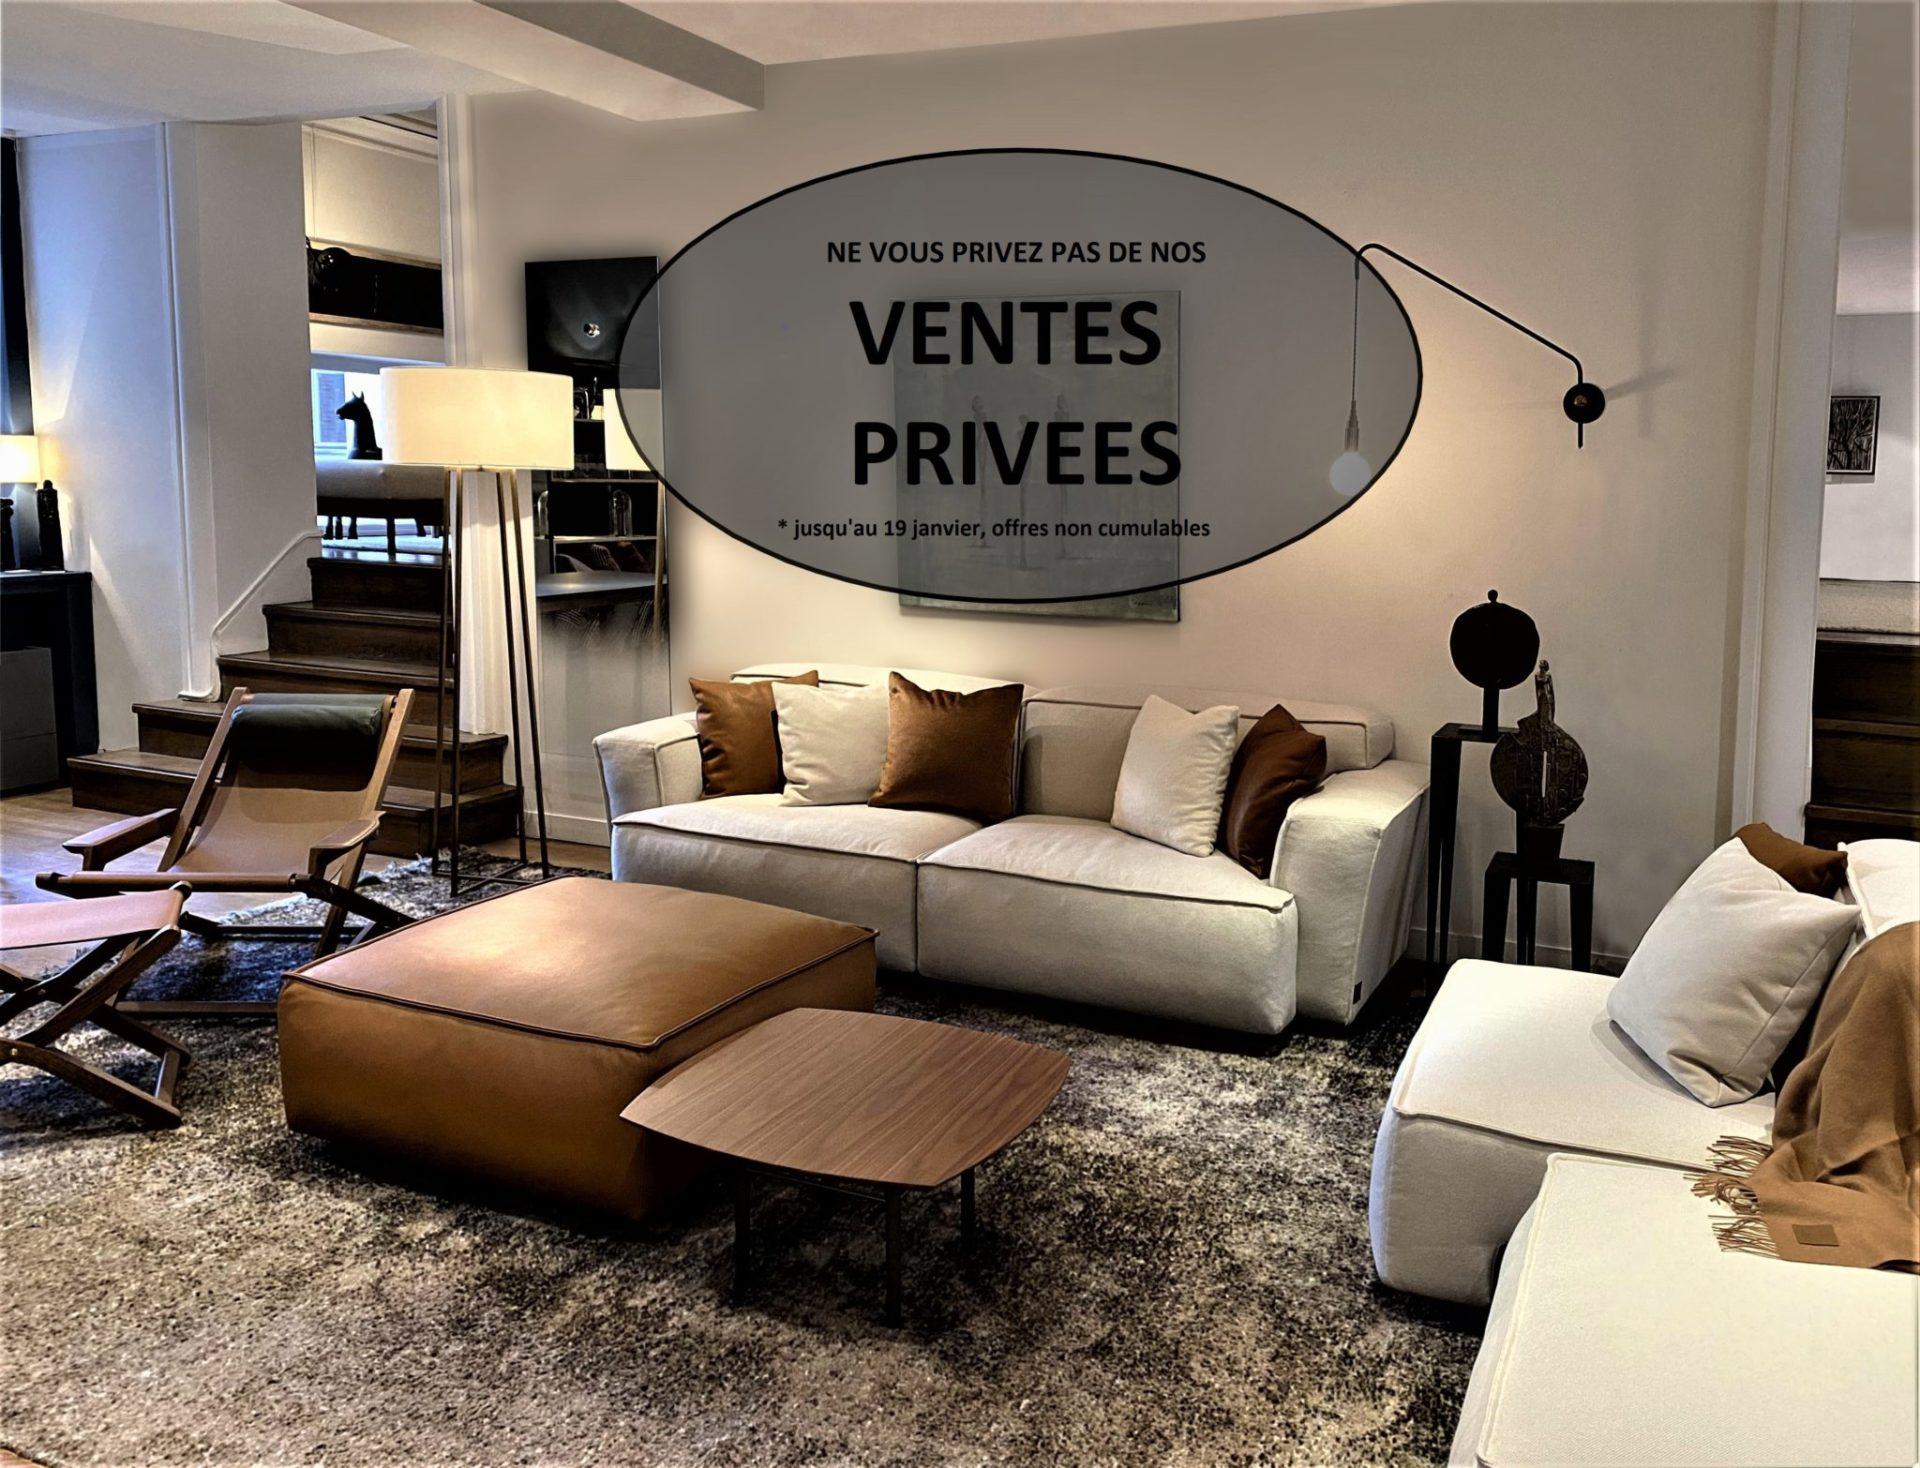 ventes privées meubles lehue angers